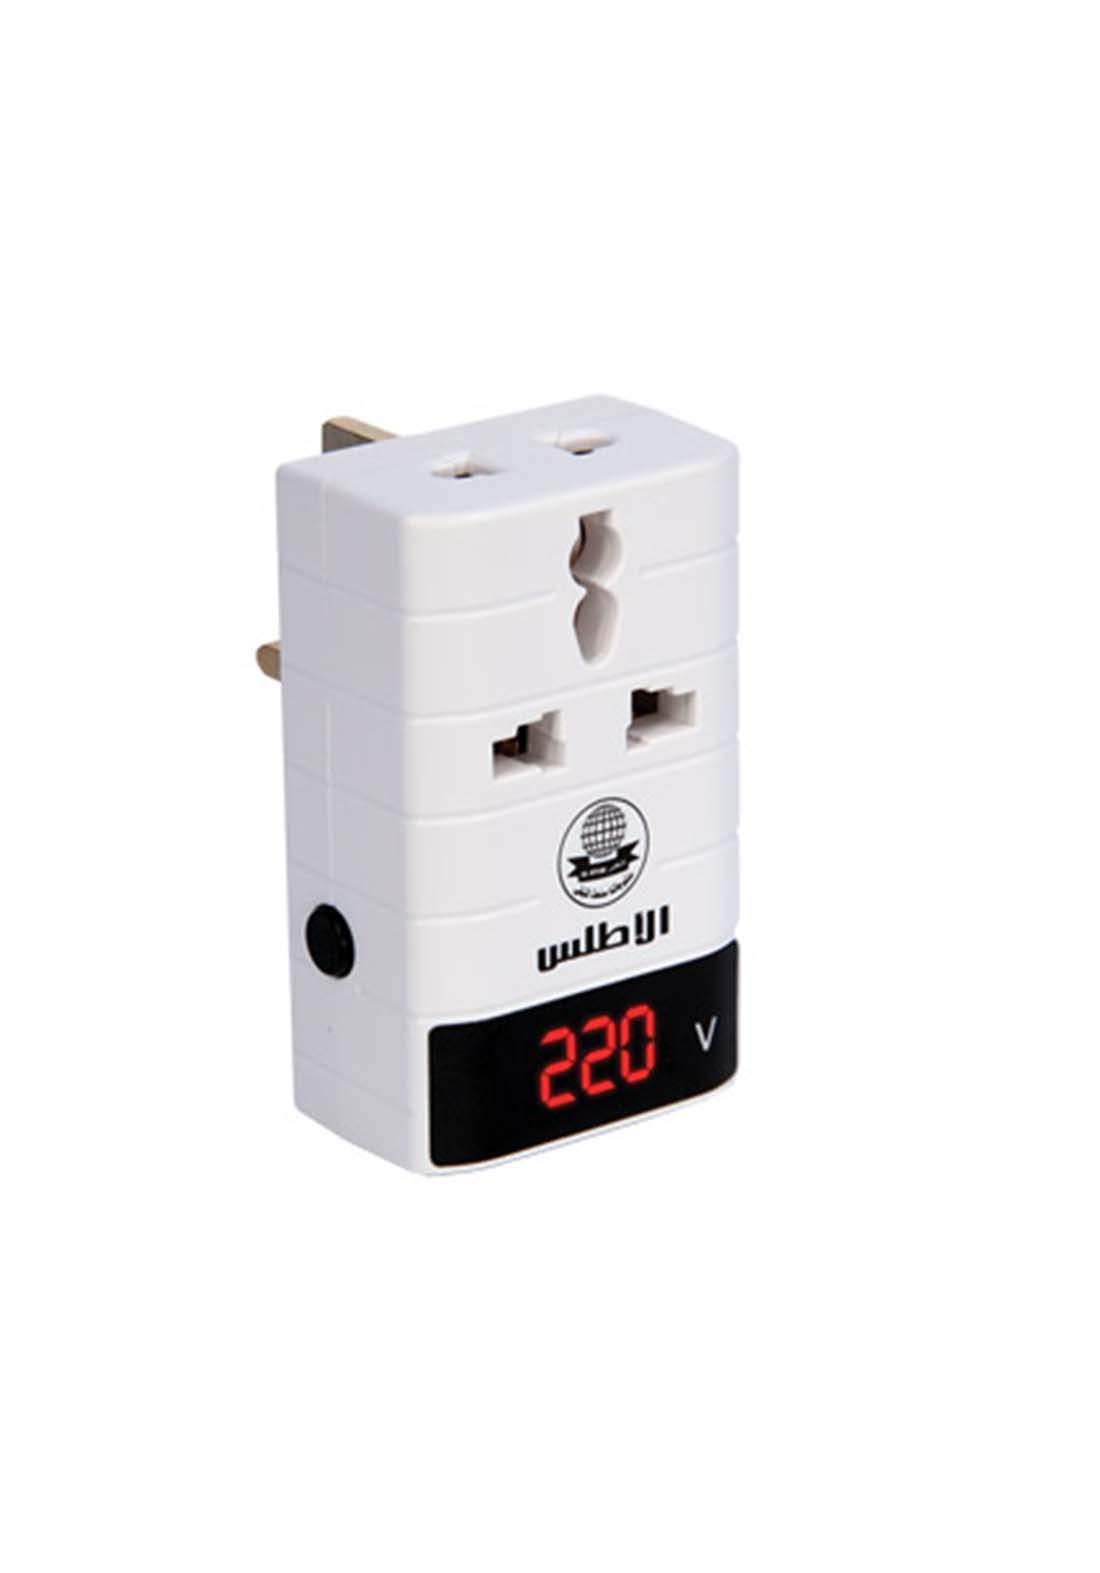 Atlas Electric Protection Device - White جهاز حماية